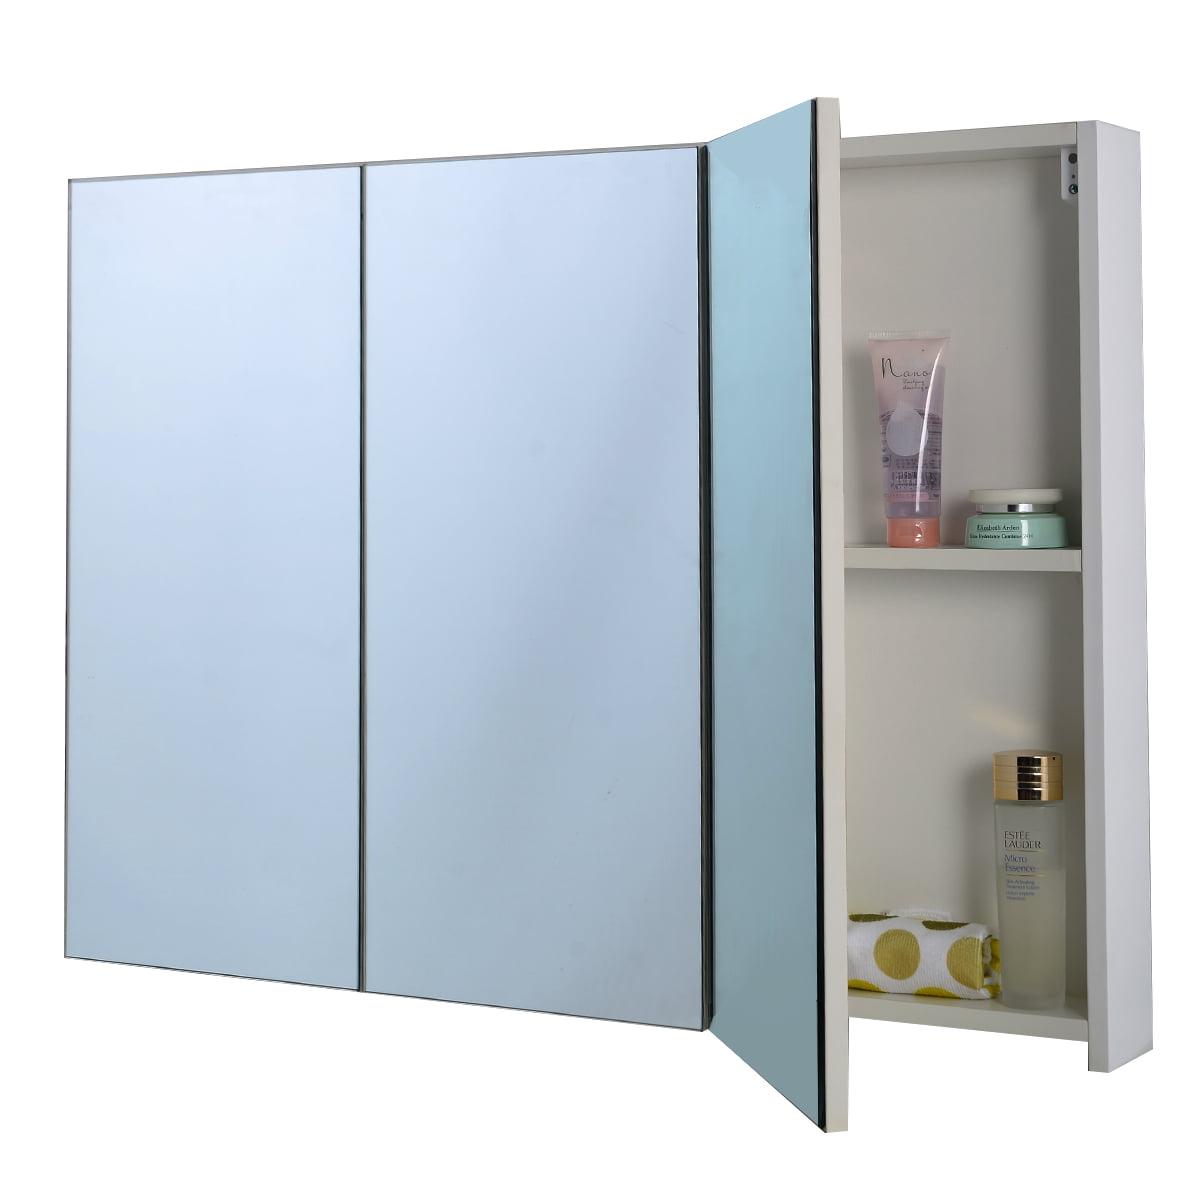 Costway 36 Wide Wall Mount Mirrored Bathroom Medicine